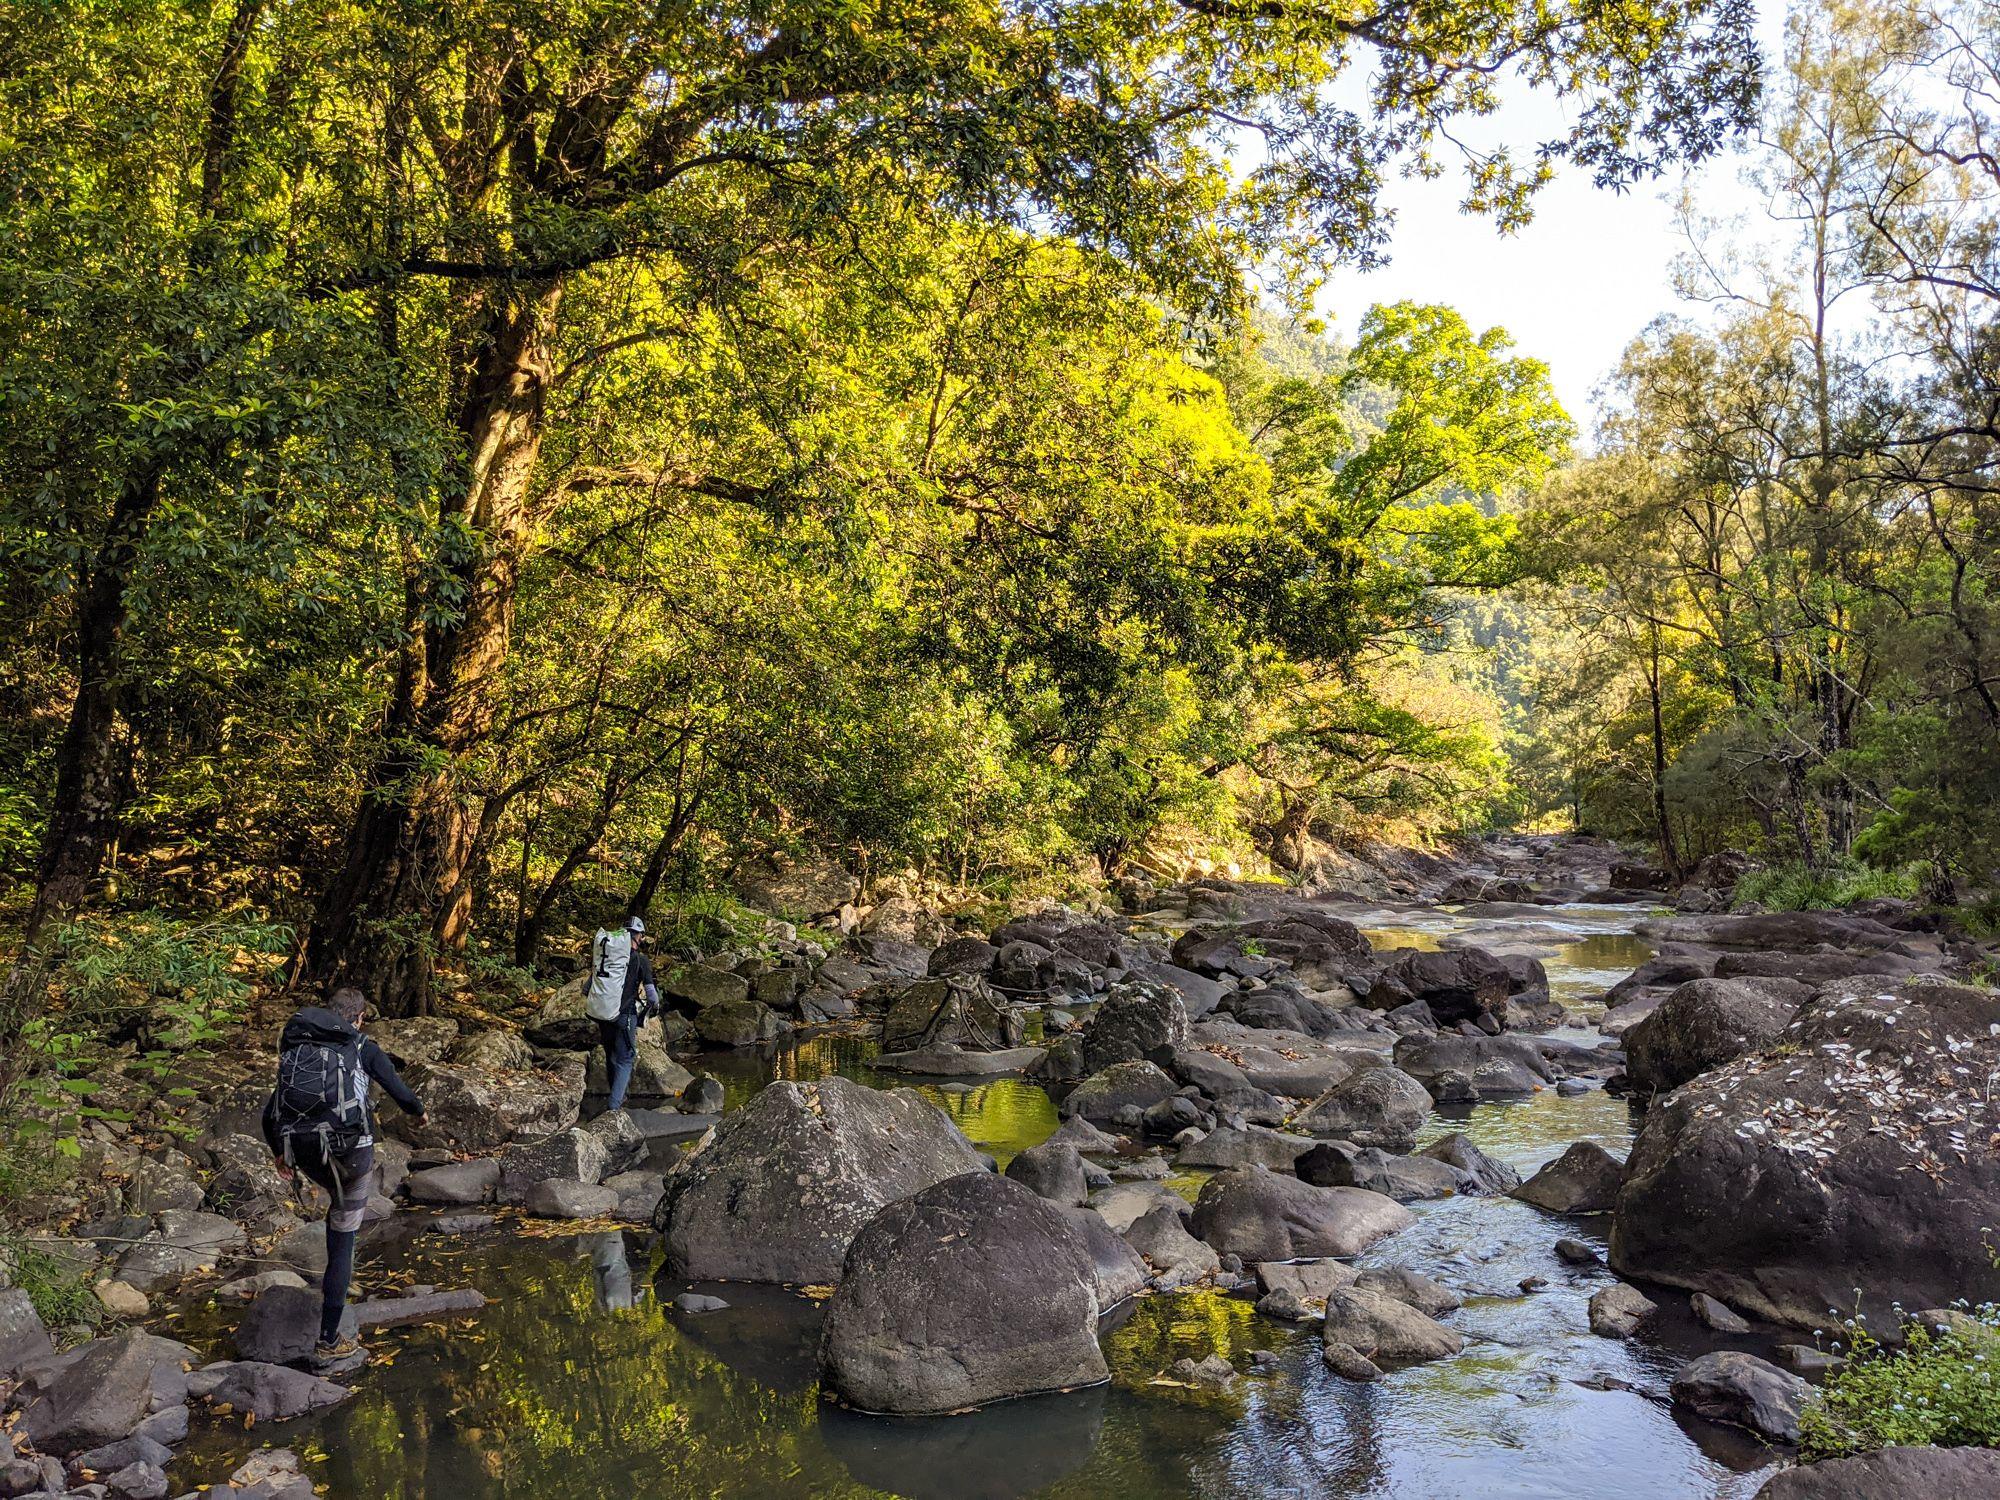 Garrawalt Creek Rock Hopping